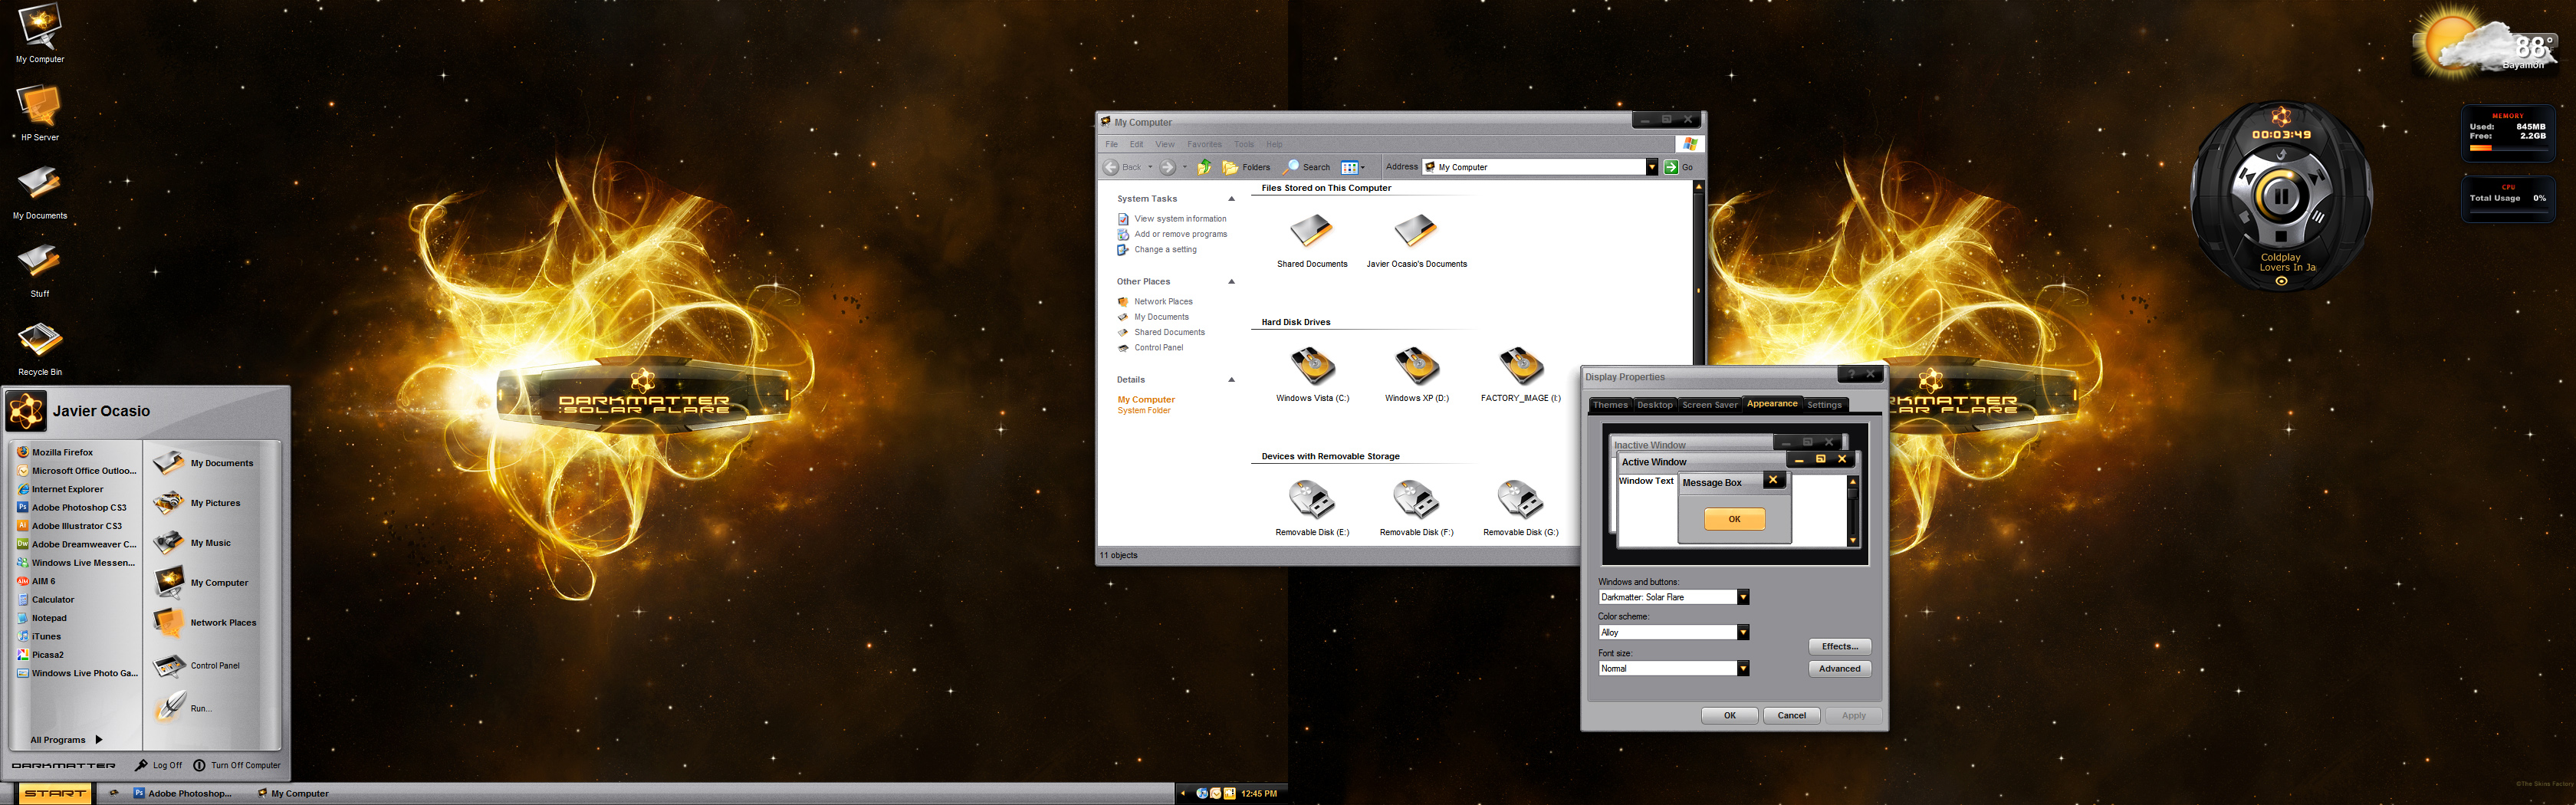 PC Desktop by javierocasio